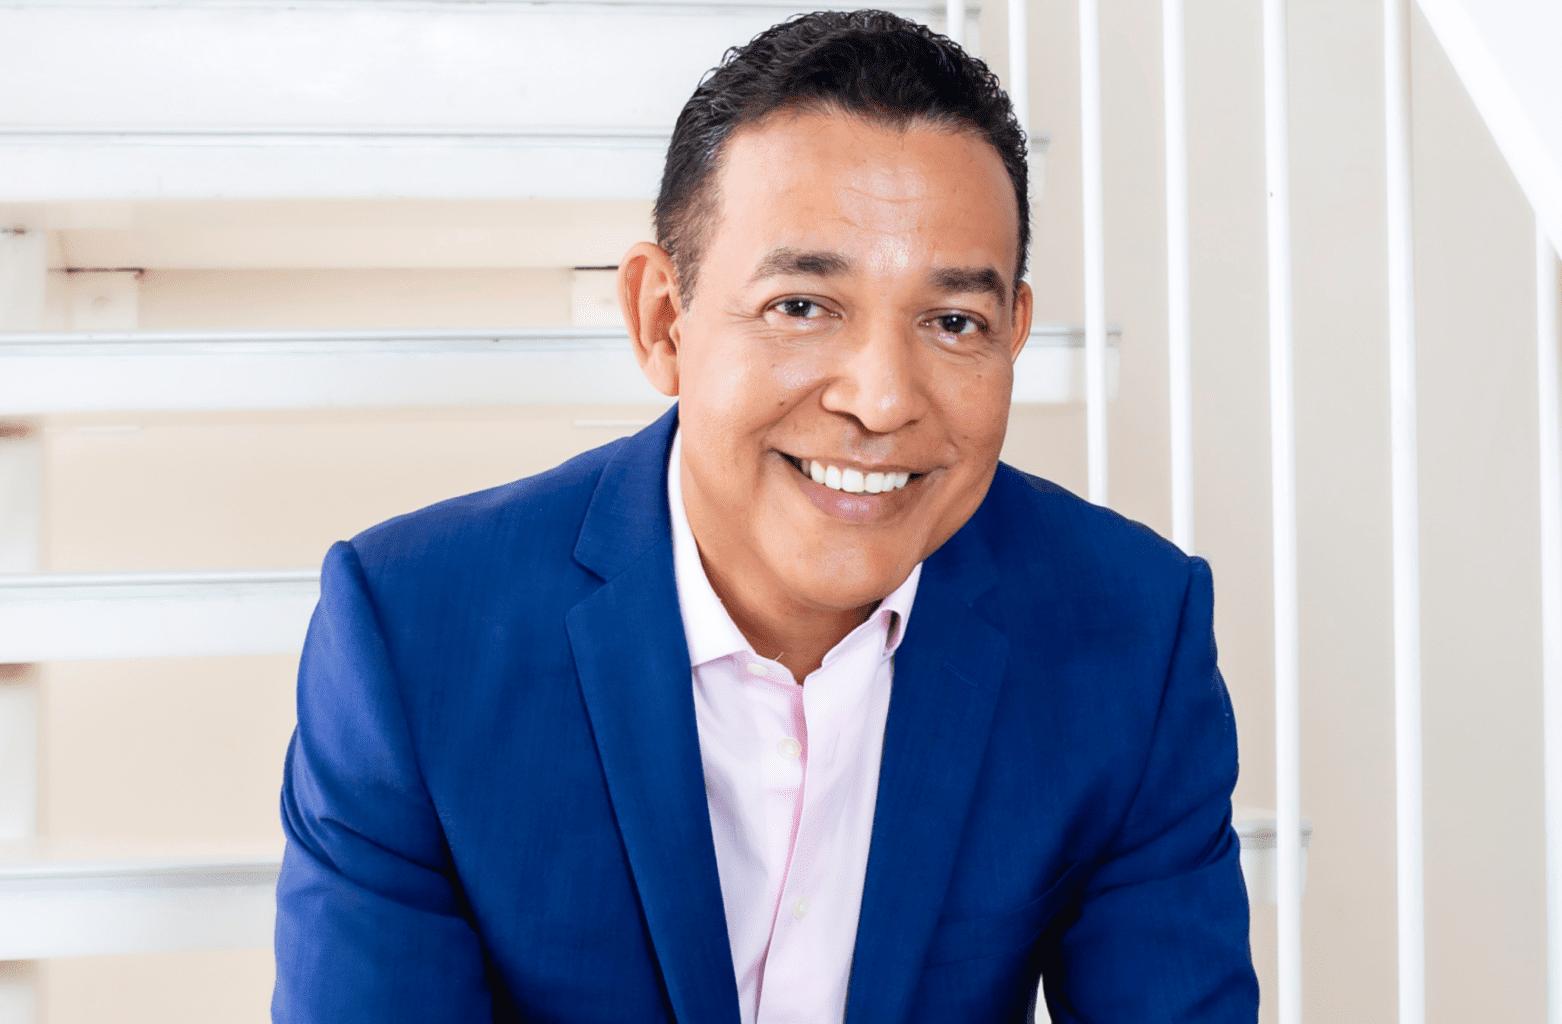 Edsel Lopez a bira managing partner di Grant Thornton Aruba y Boneiro